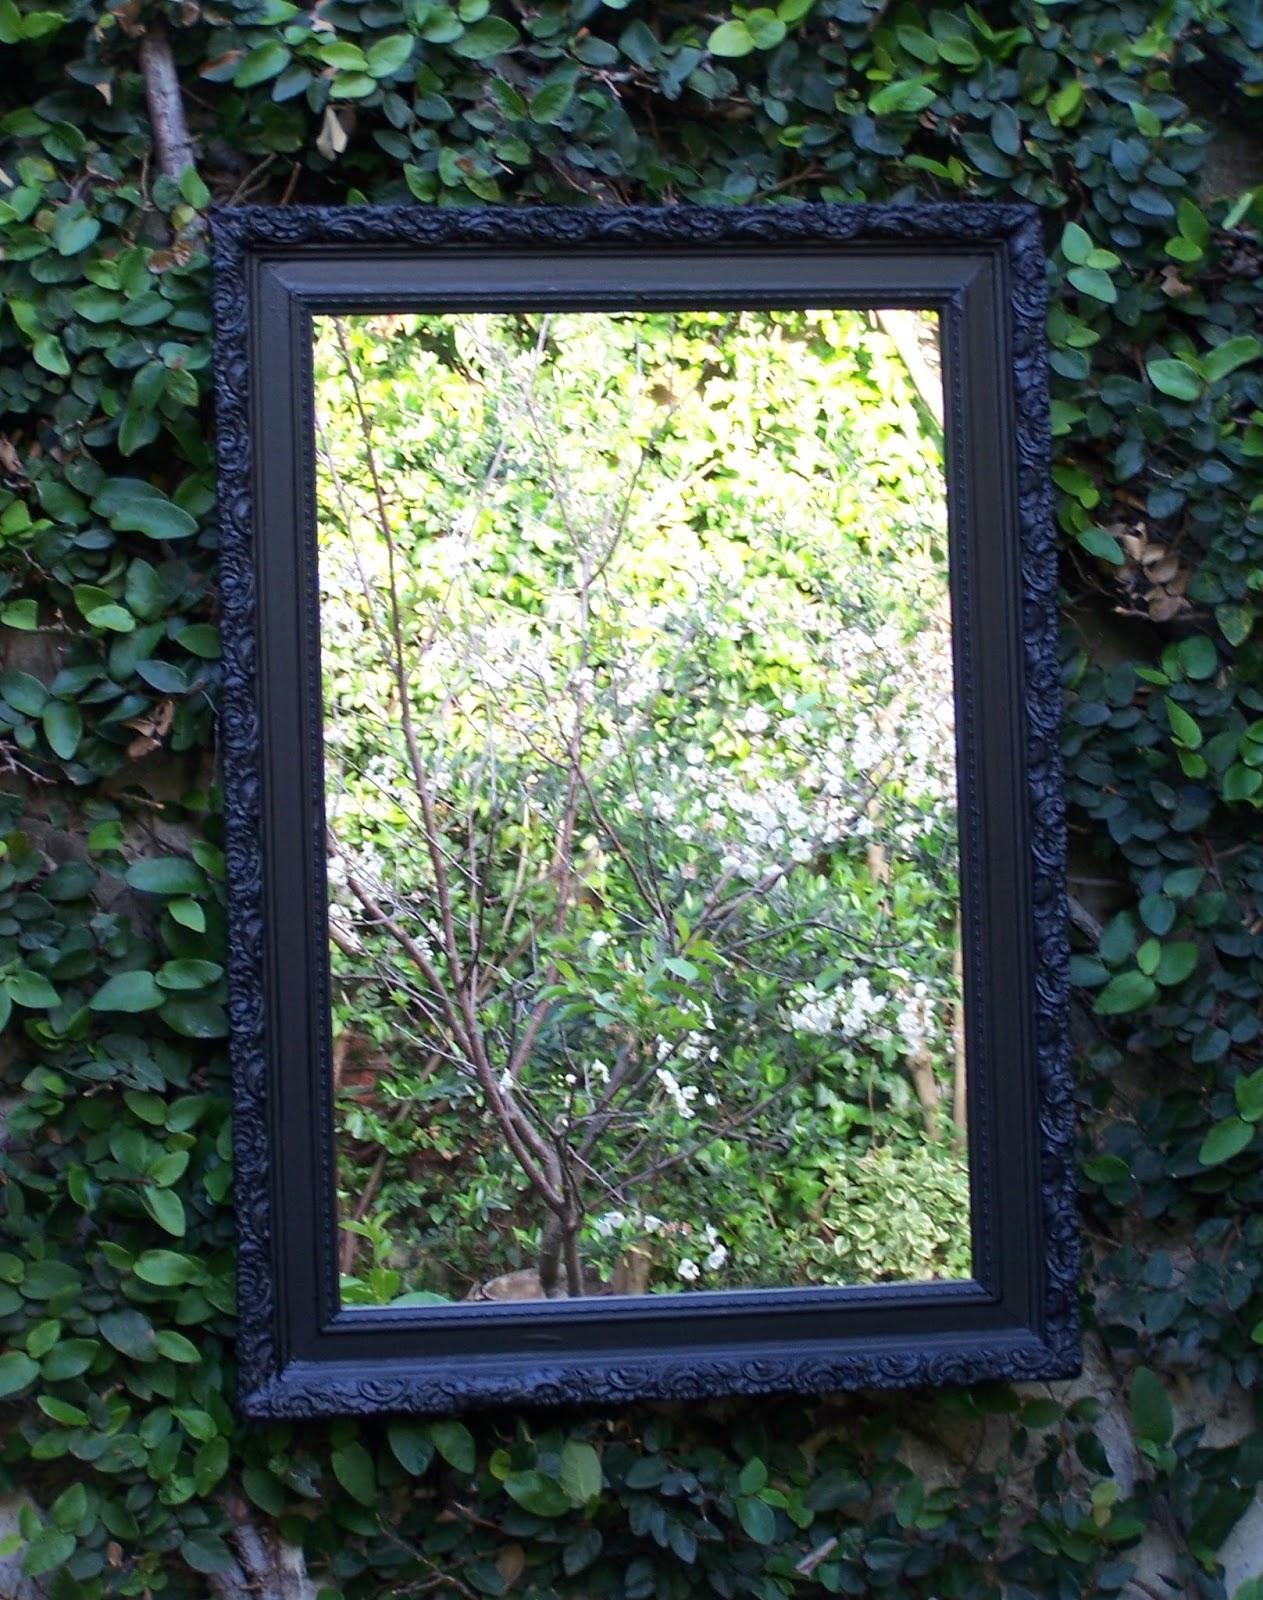 Chiribitil: Espejo marco antiguo madera y yeso en negro mate